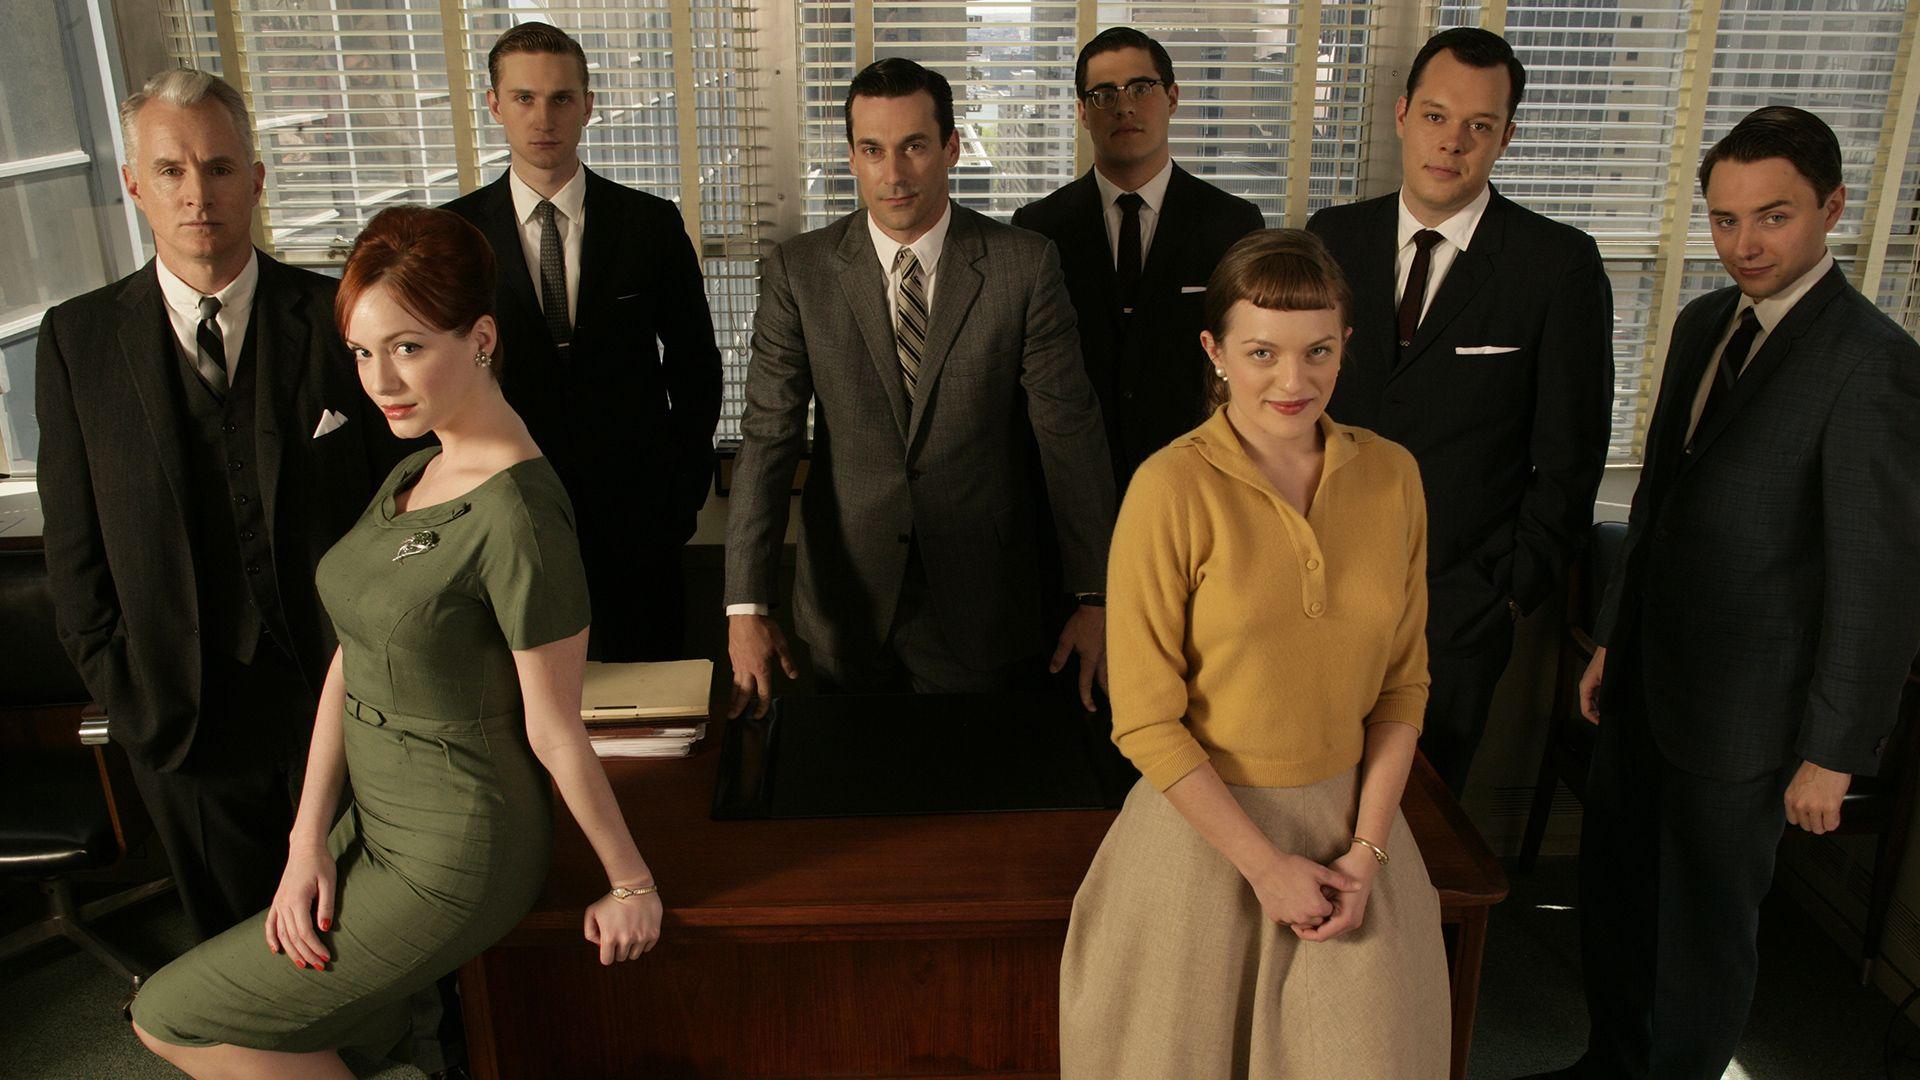 The Mad Men cast in Season 1